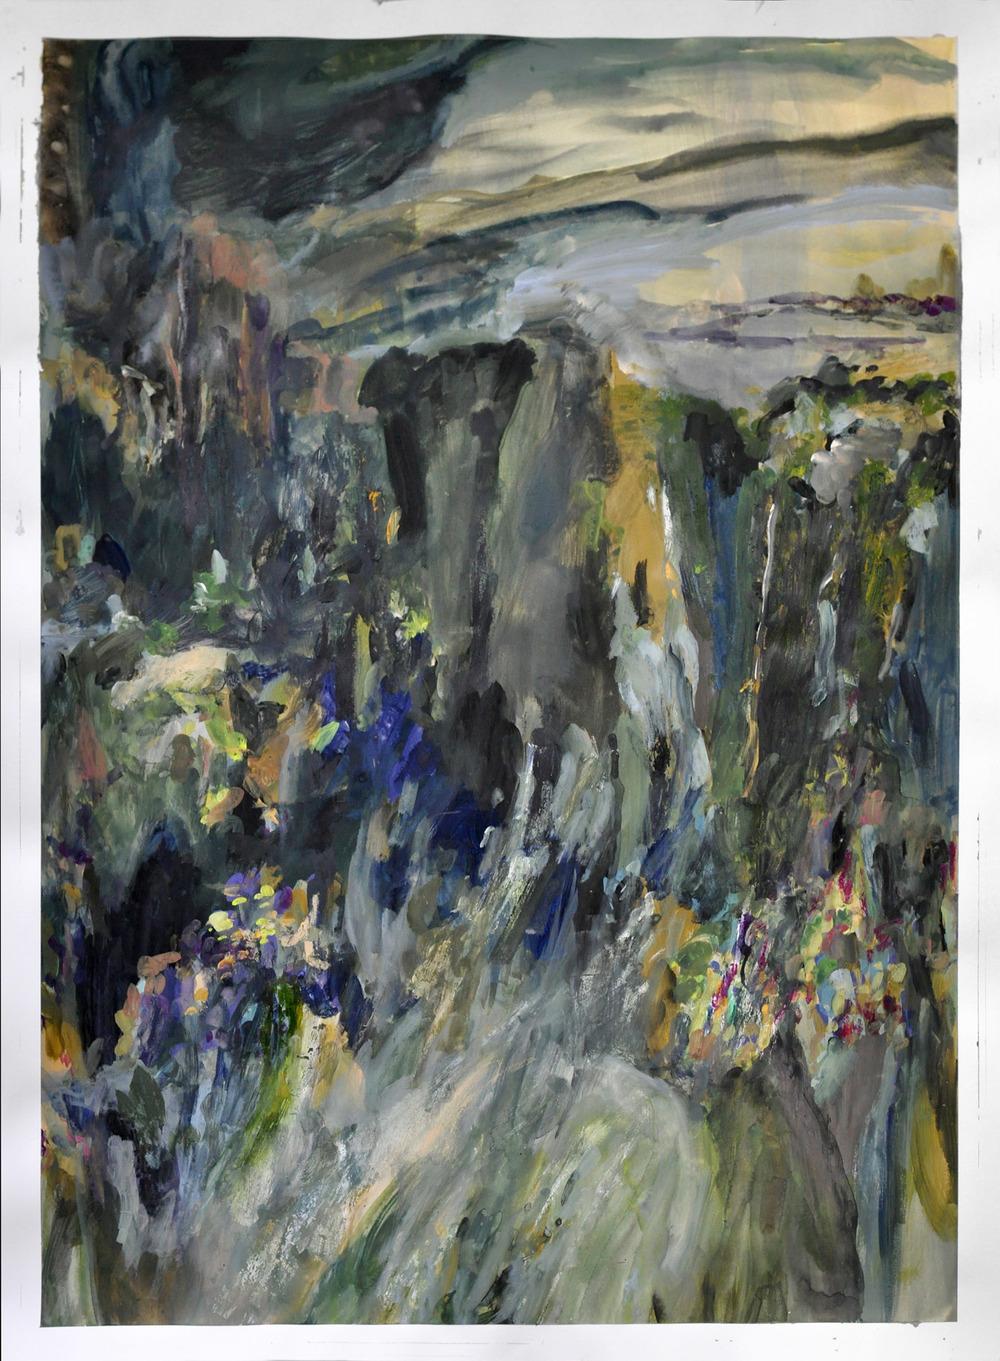 Niagara I ,2014 gouache and oil on paper 105 x 75 cm